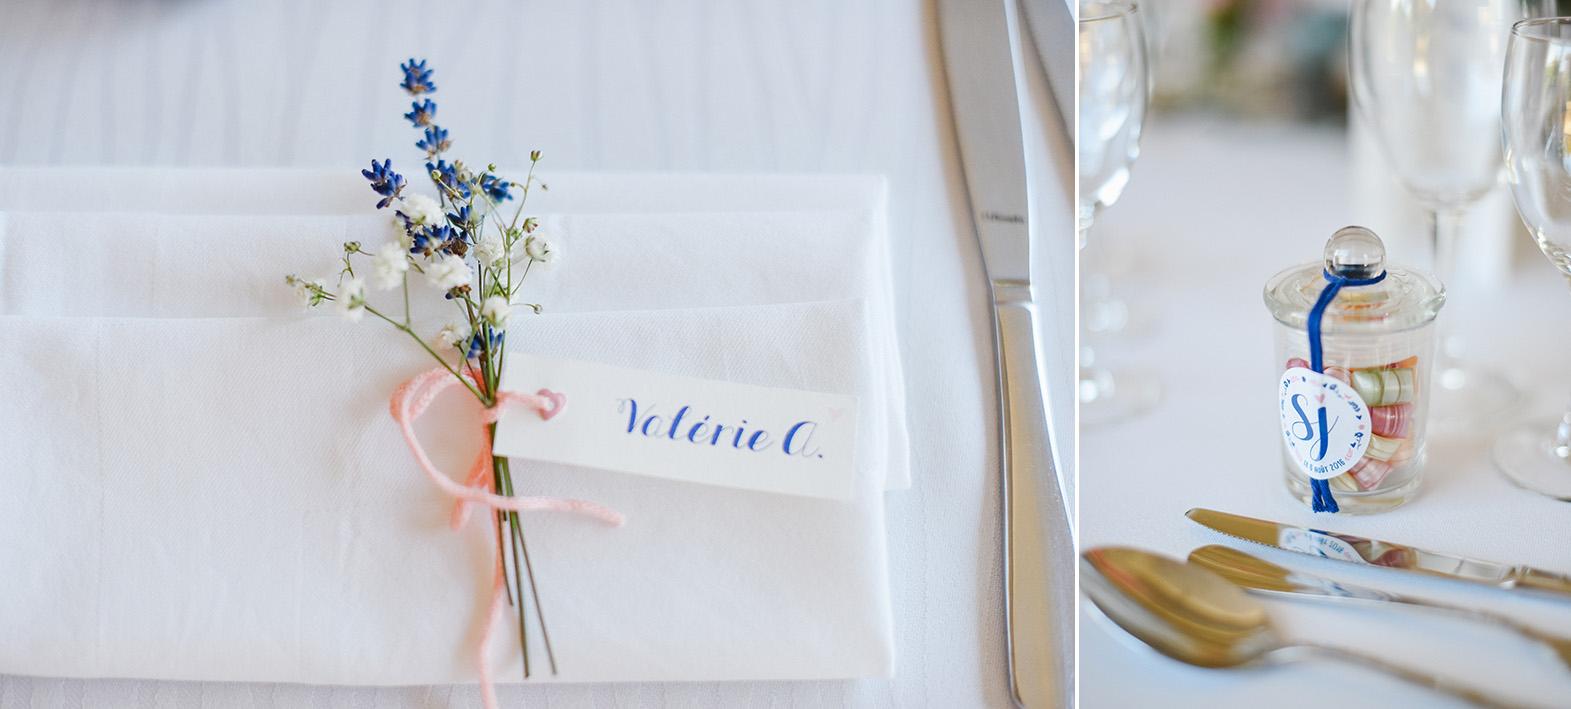 mariage_sj_manoir-de-kerbot_56_photographe_clemence_dubois-mep-4